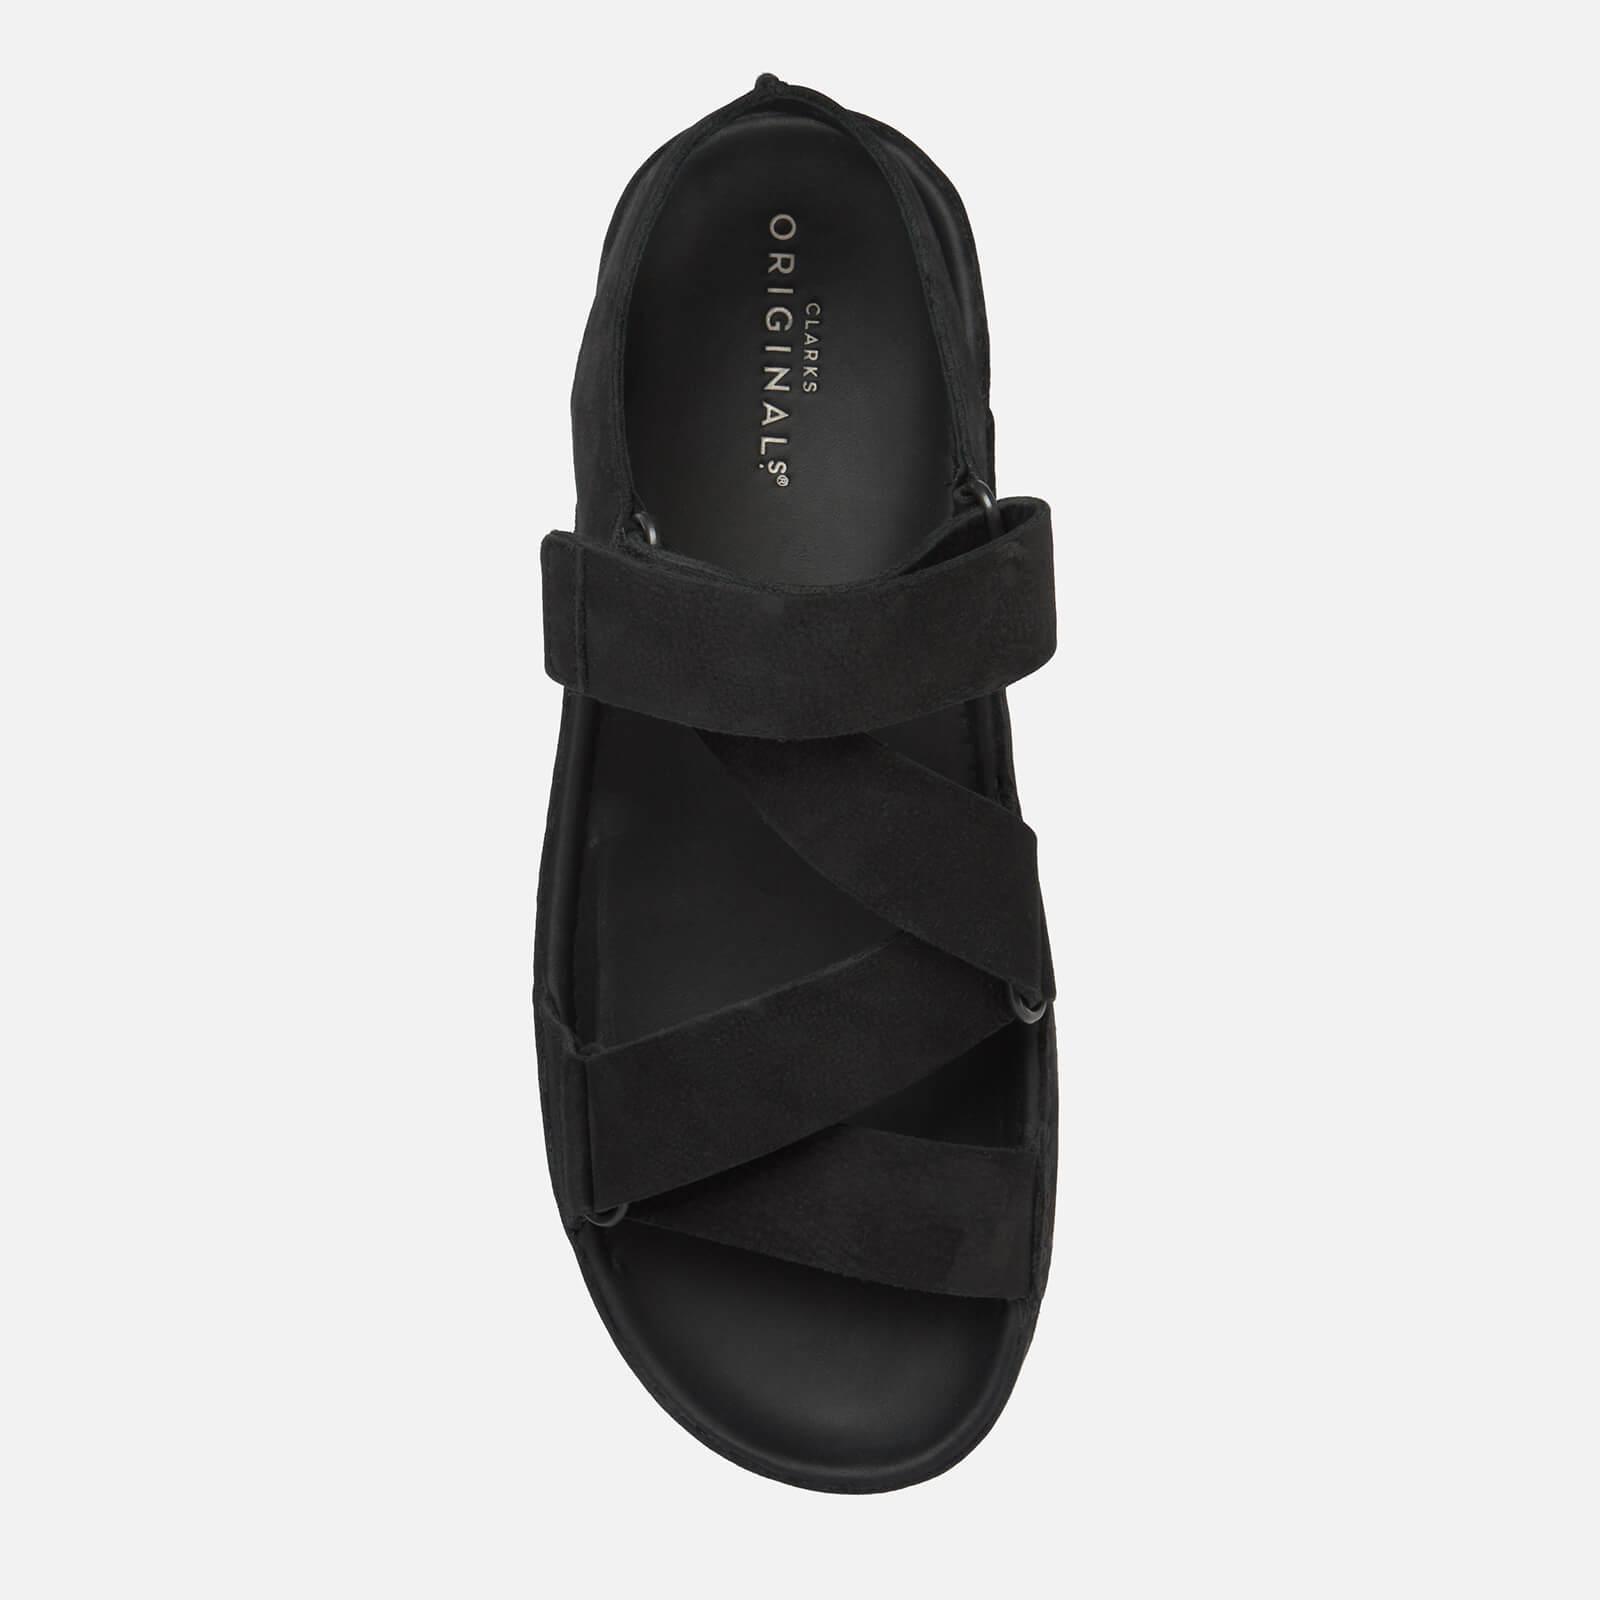 7a1b17881385 Clarks - Black Ranger Sport Nubuck Sandals for Men - Lyst. View fullscreen